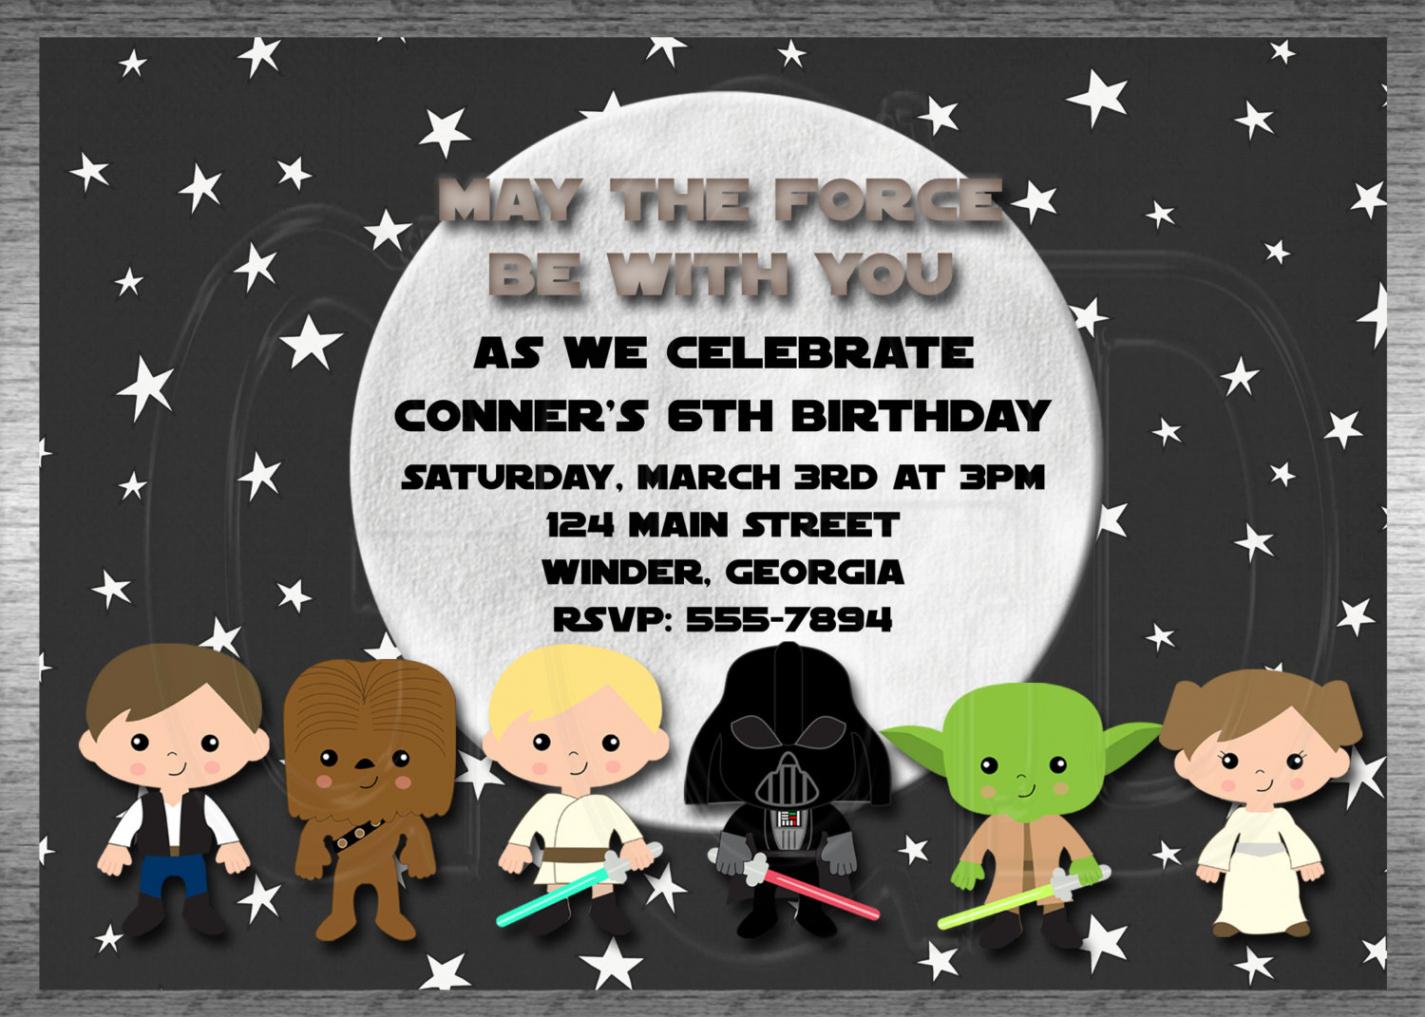 Elegantcustomize 1000 Free Printable Star Wars Baby Shower Invites - Free Printable Star Wars Baby Shower Invites